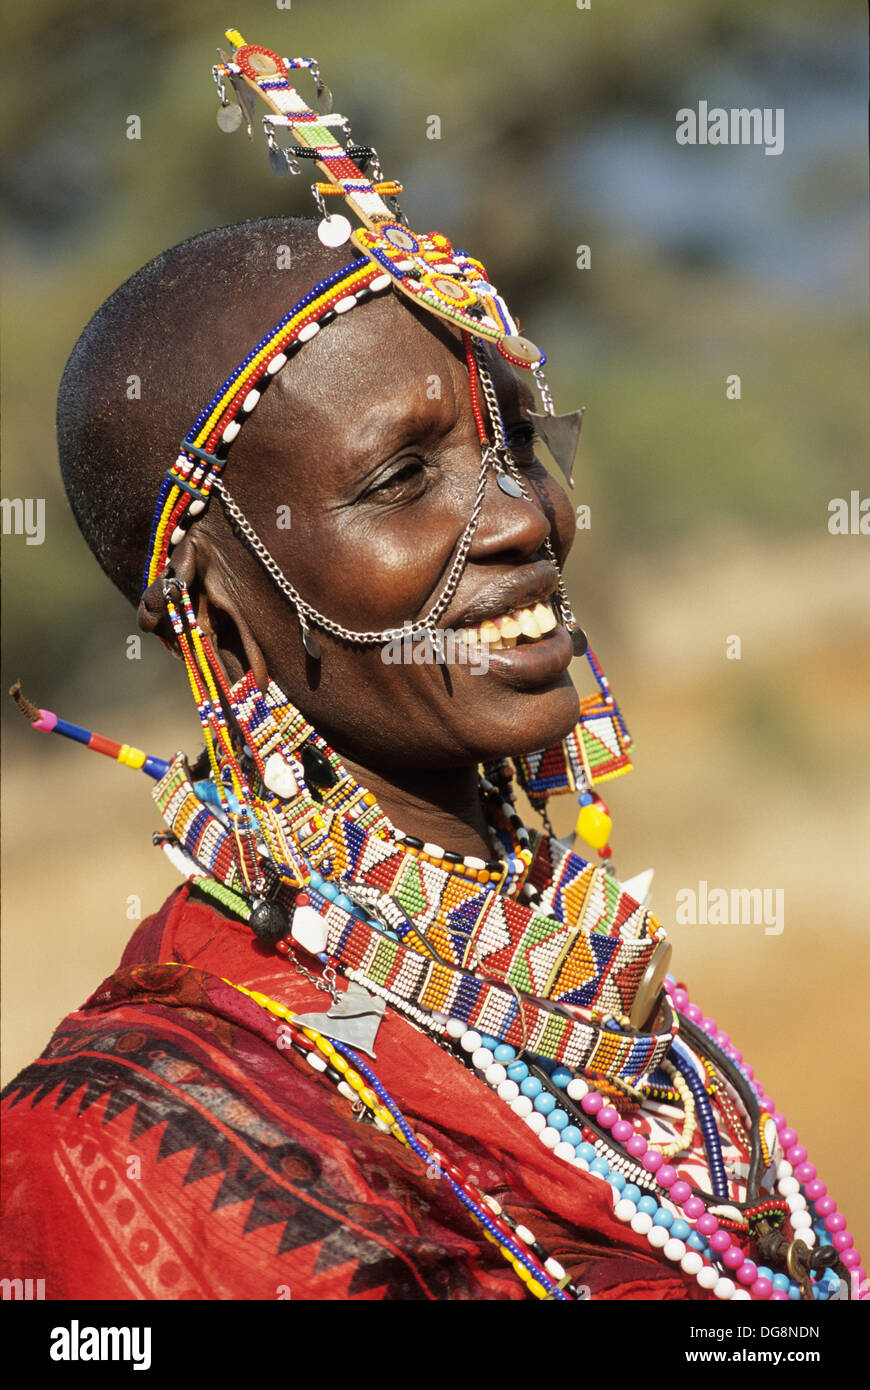 femme masai portant des bijoux de perles extraordinaires en regard du stock photo royalty free. Black Bedroom Furniture Sets. Home Design Ideas